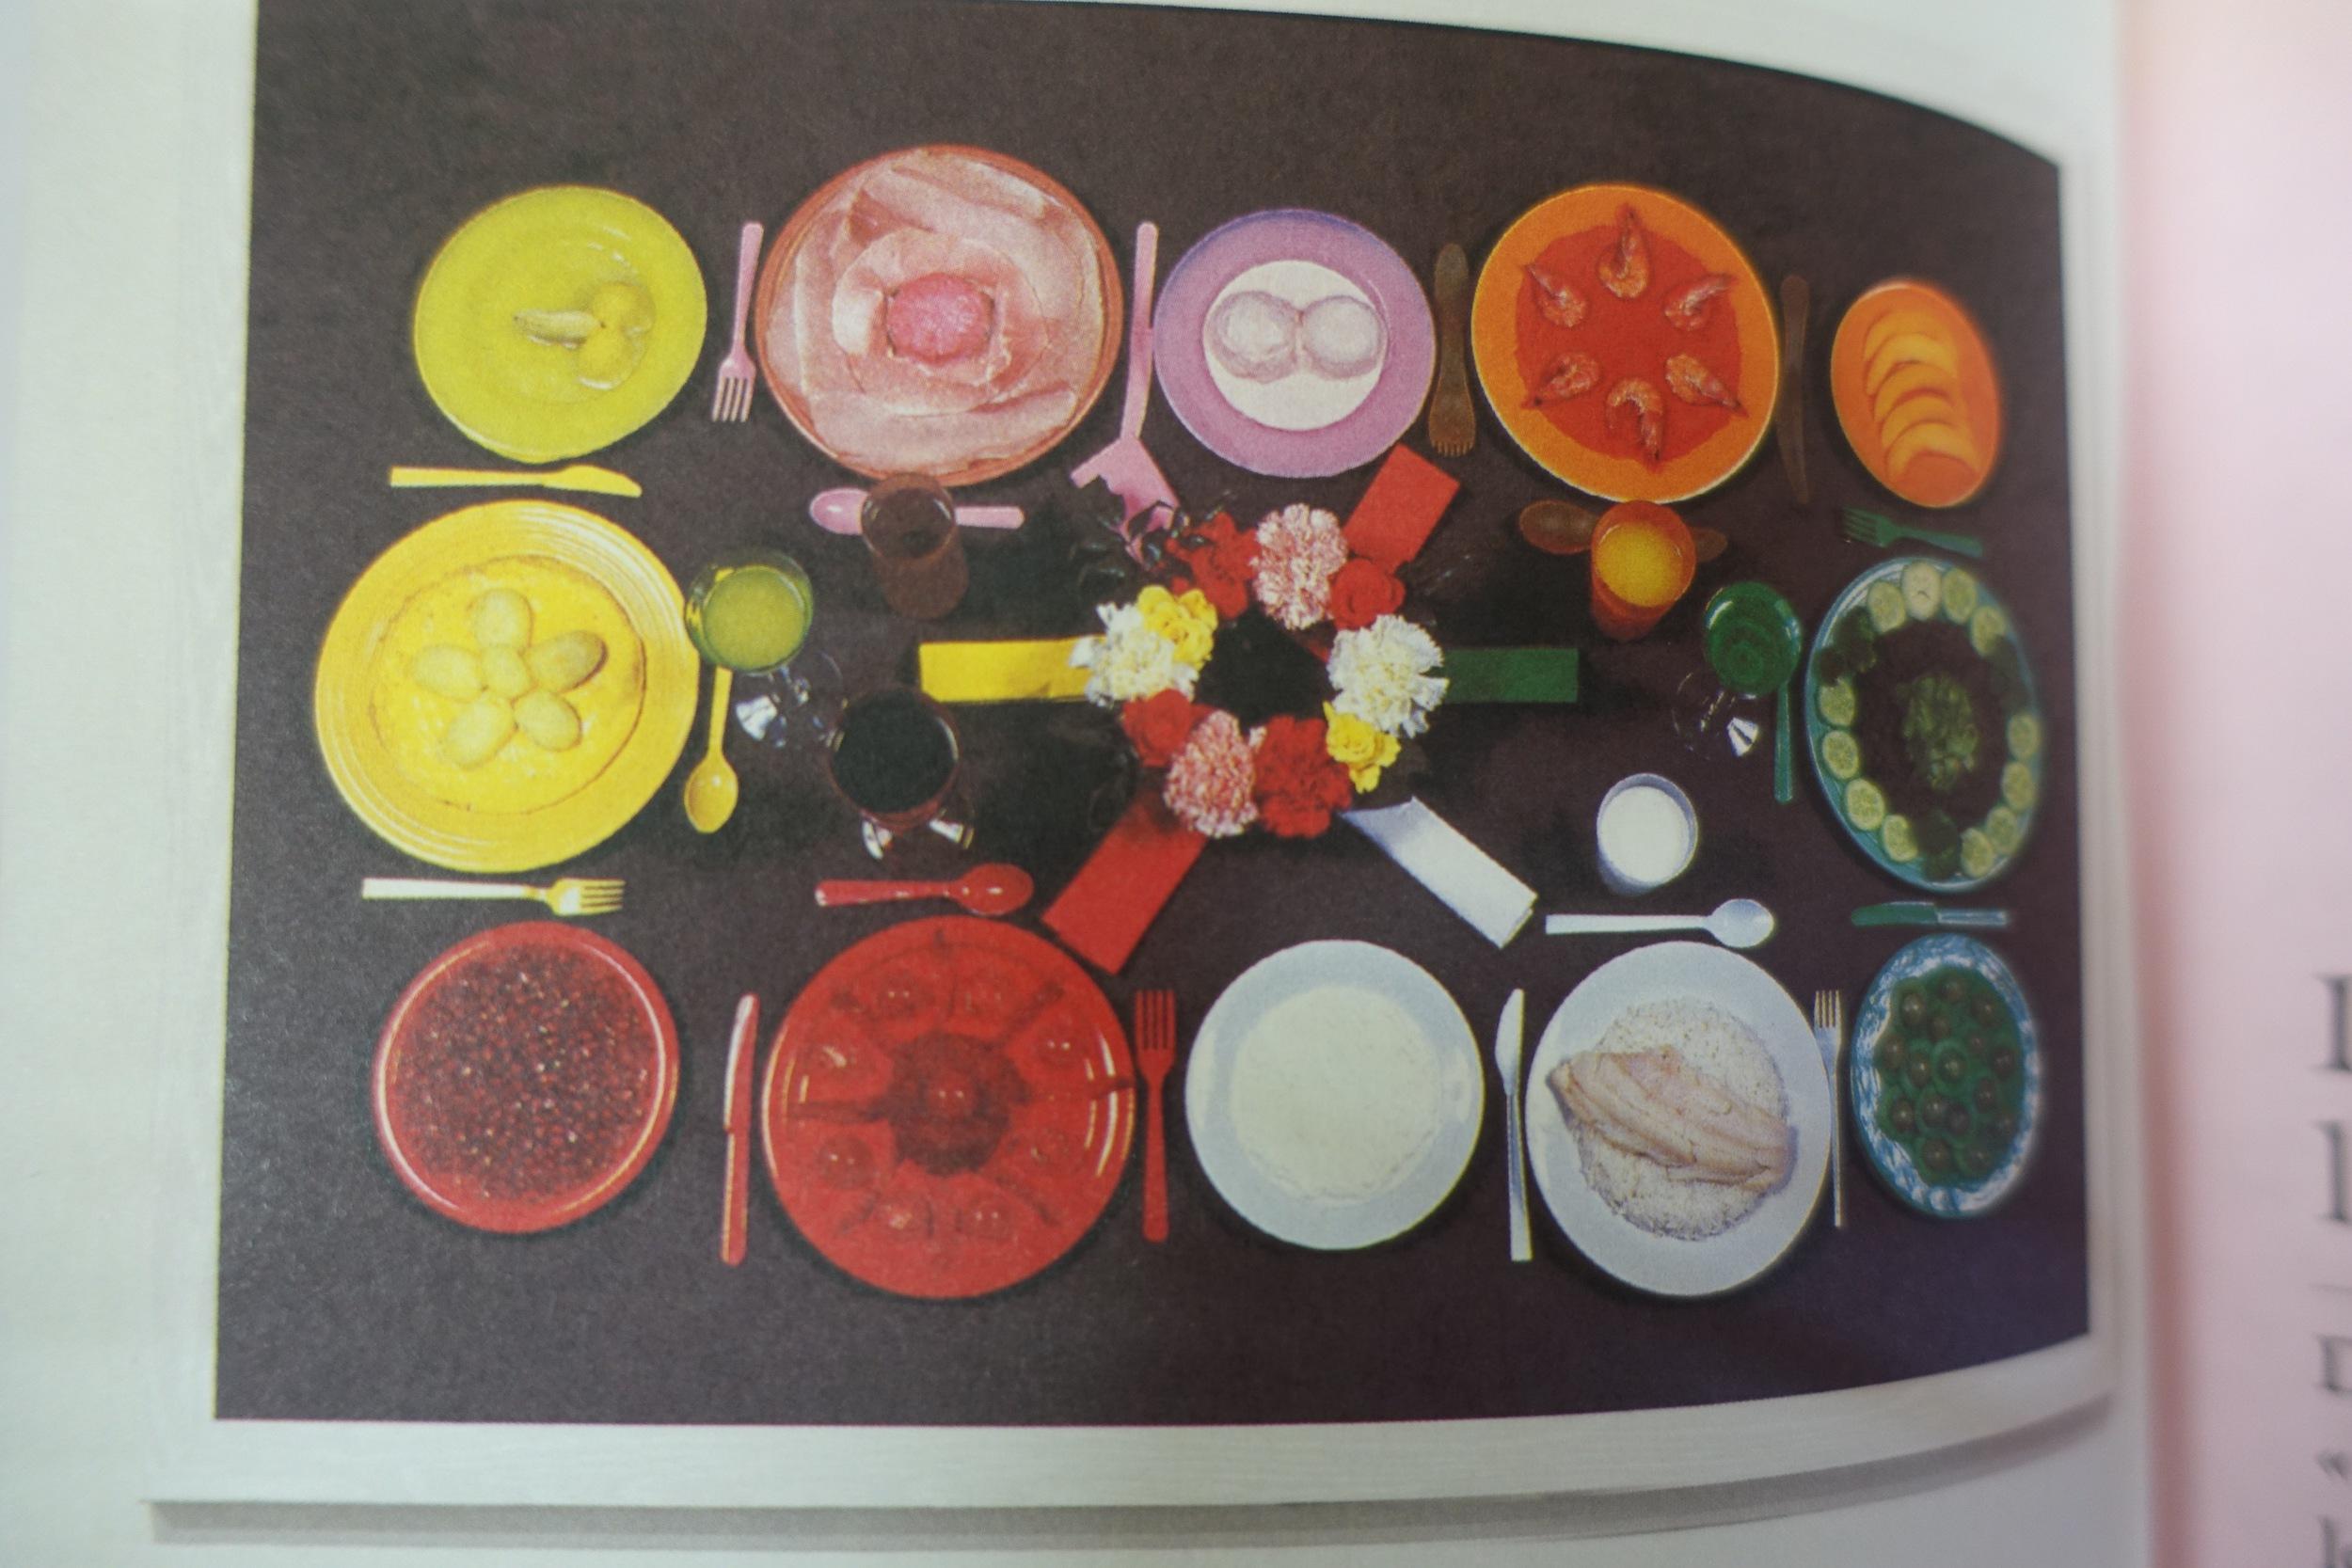 Chromatic Diet, Sophie Calle, 1998